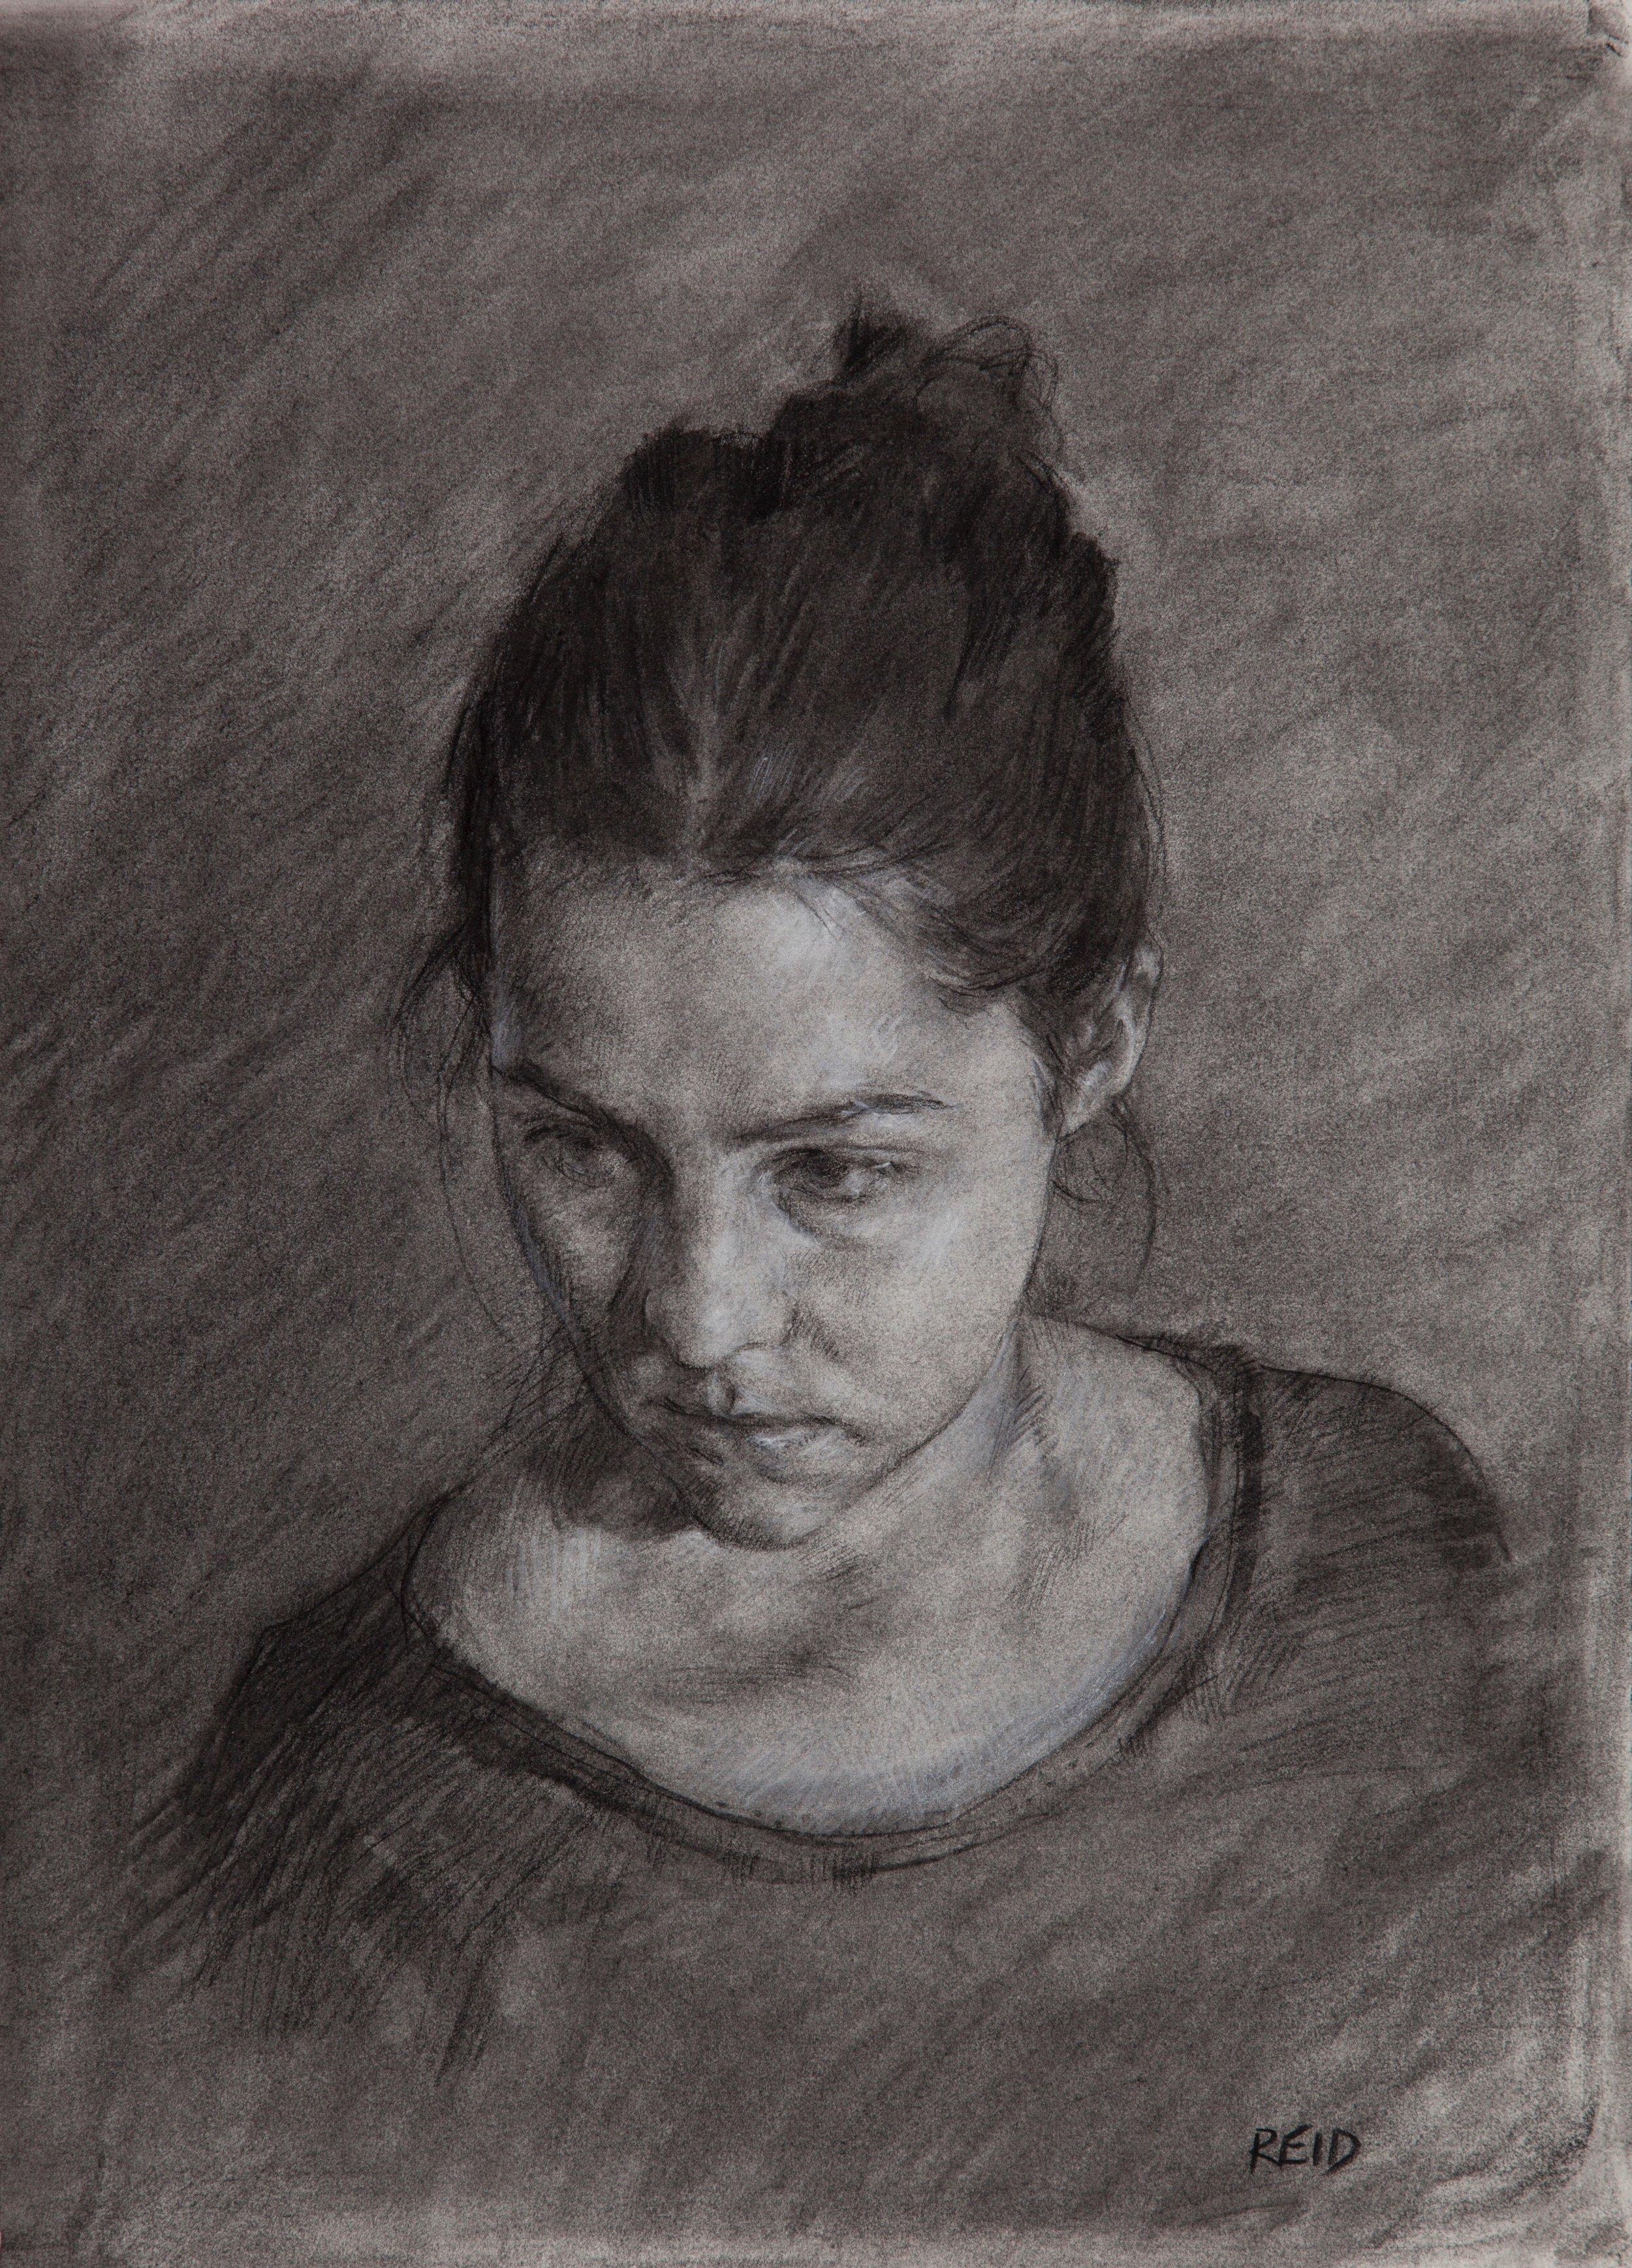 Heather Portrait Study, 2015, charcoal, 35.5 x 25.5 cms (2)